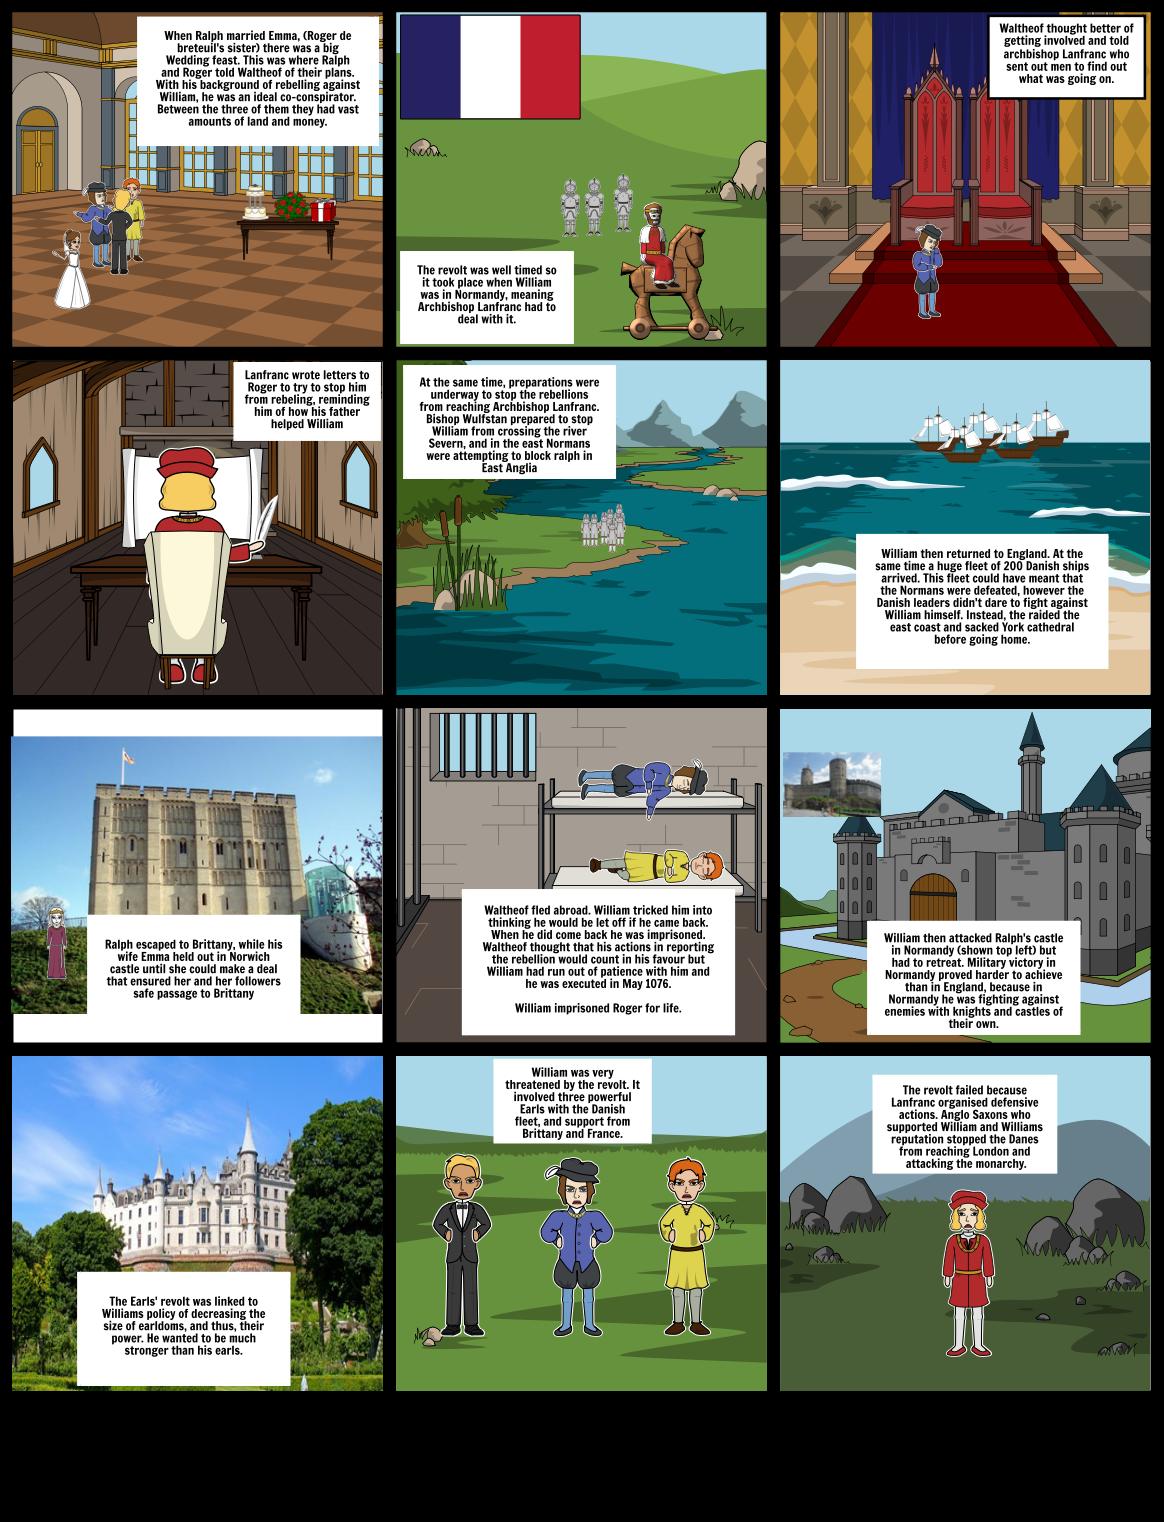 Revolt of the Earls, 1075